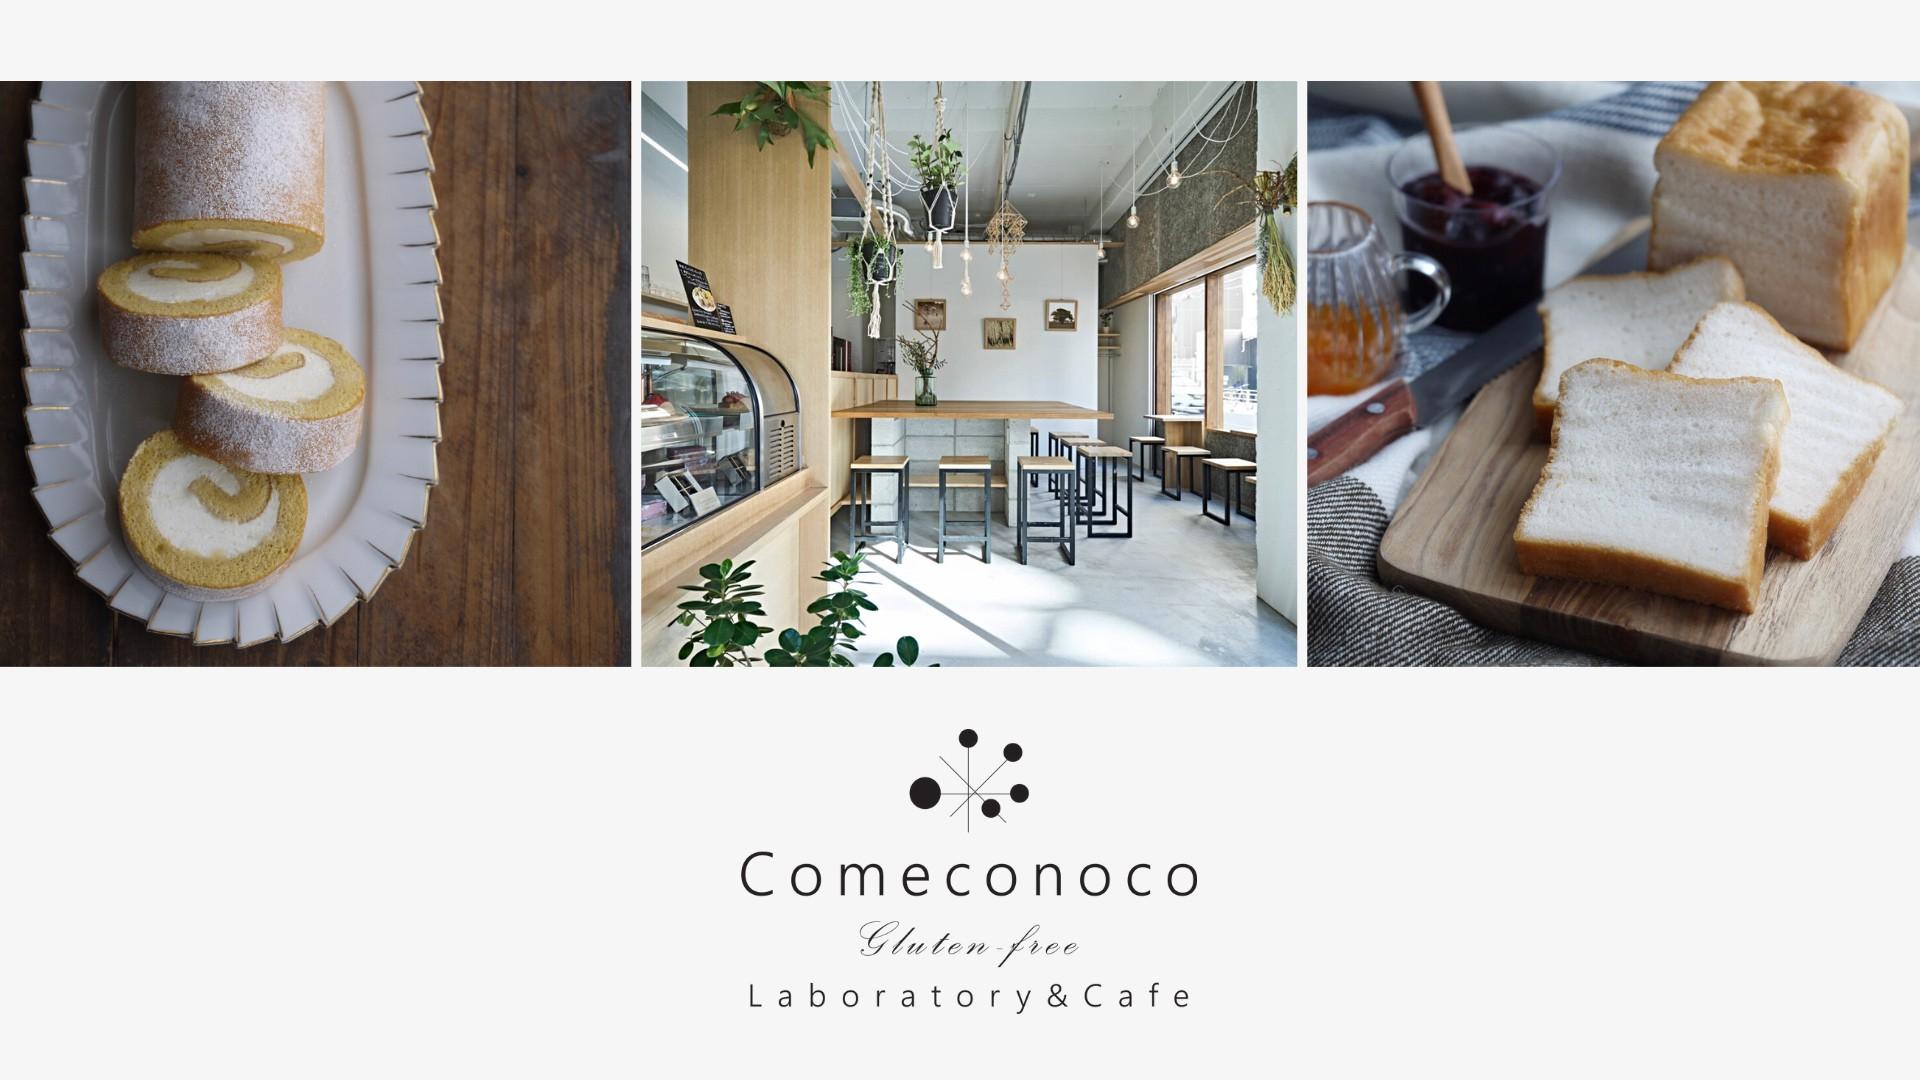 Comeconoco Laboratory & Cafe